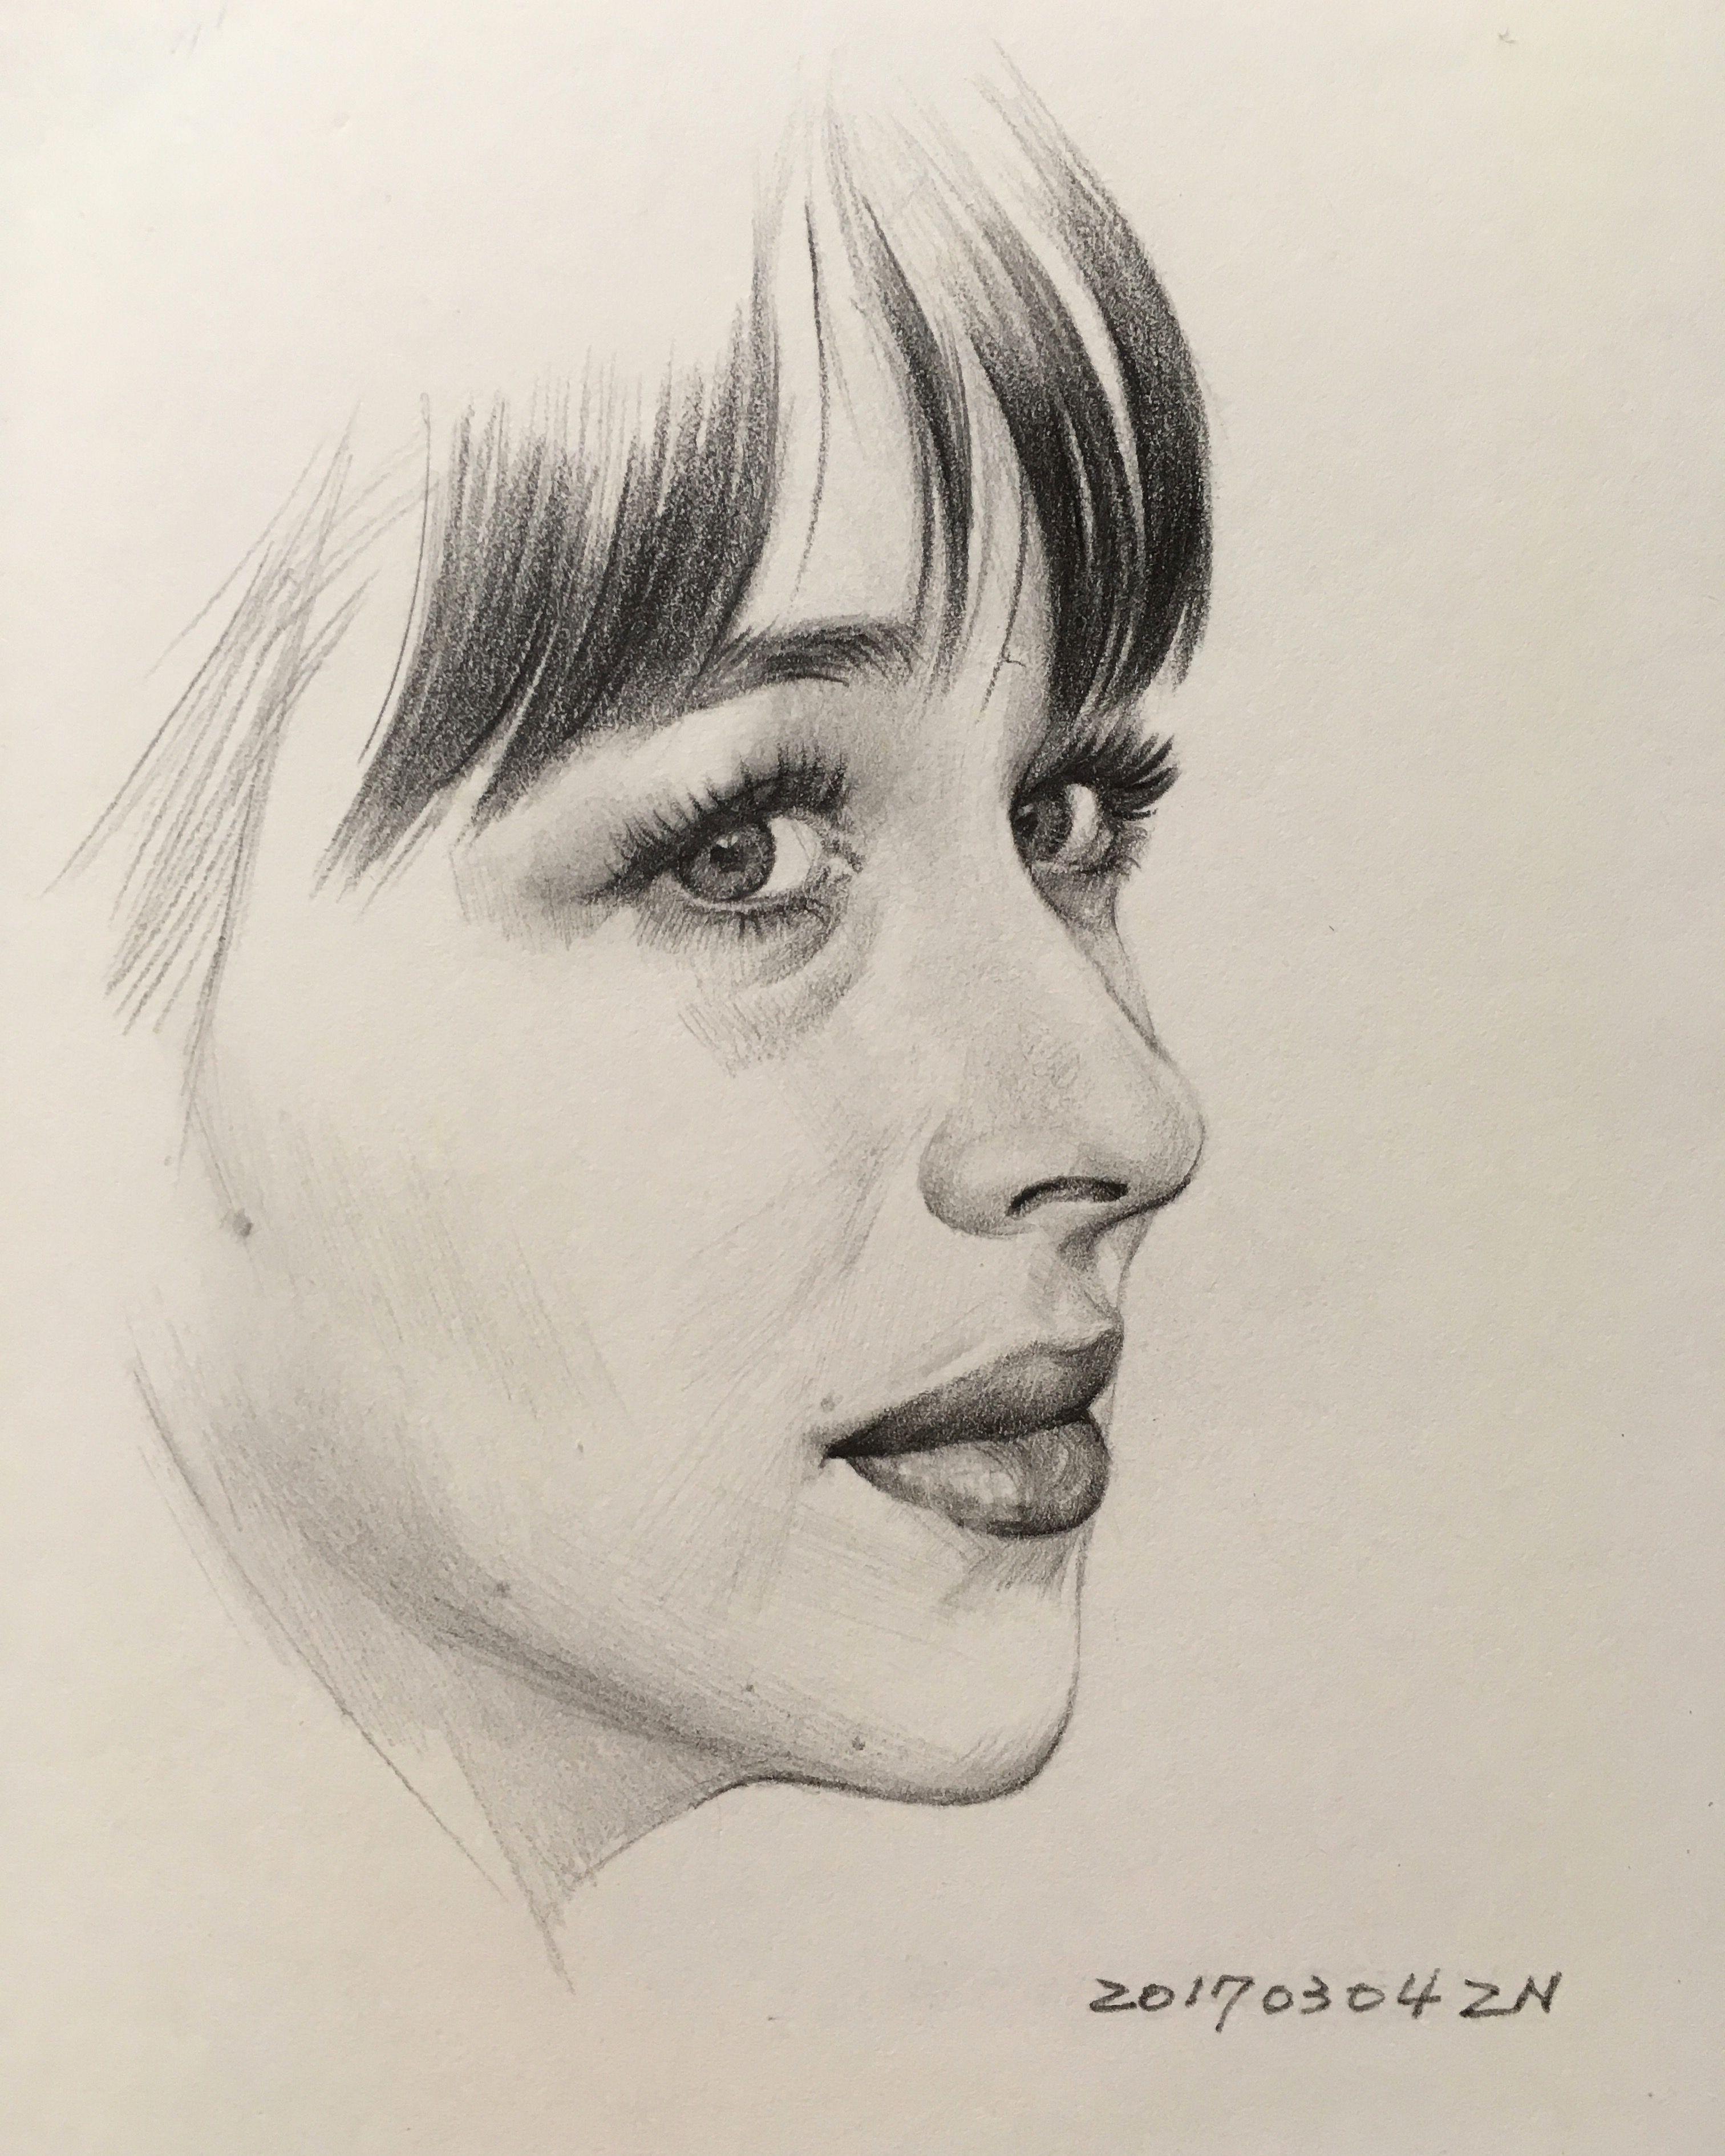 Dakota johnson pencil drawing by zahn k